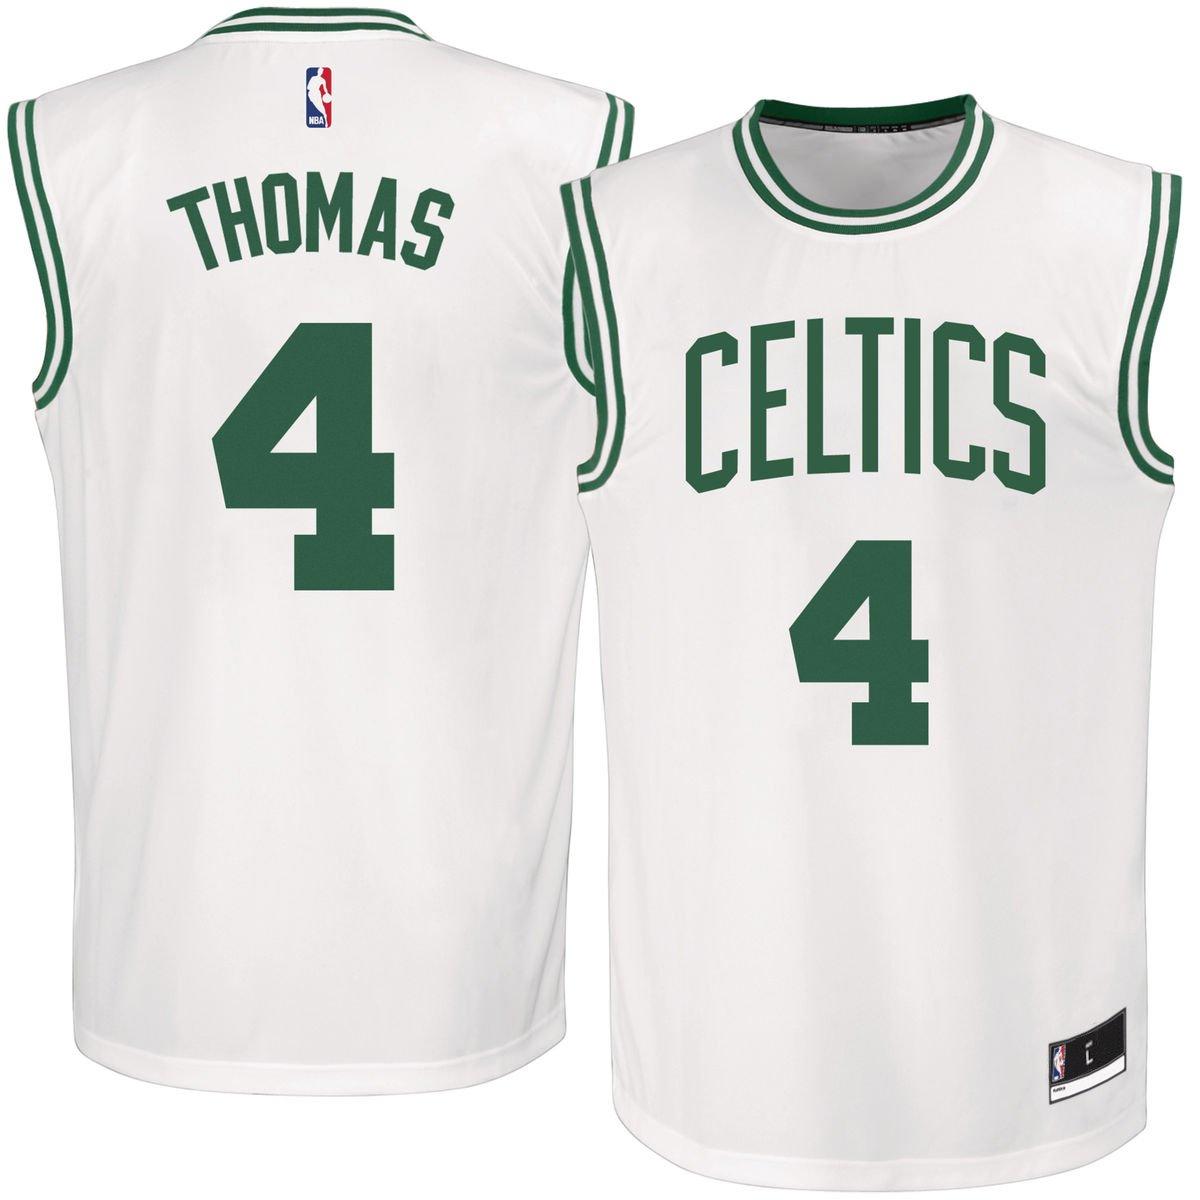 online store f4ac2 d9304 Isaiah Thomas Boston Celtics #4 White Youth Replica Jersey